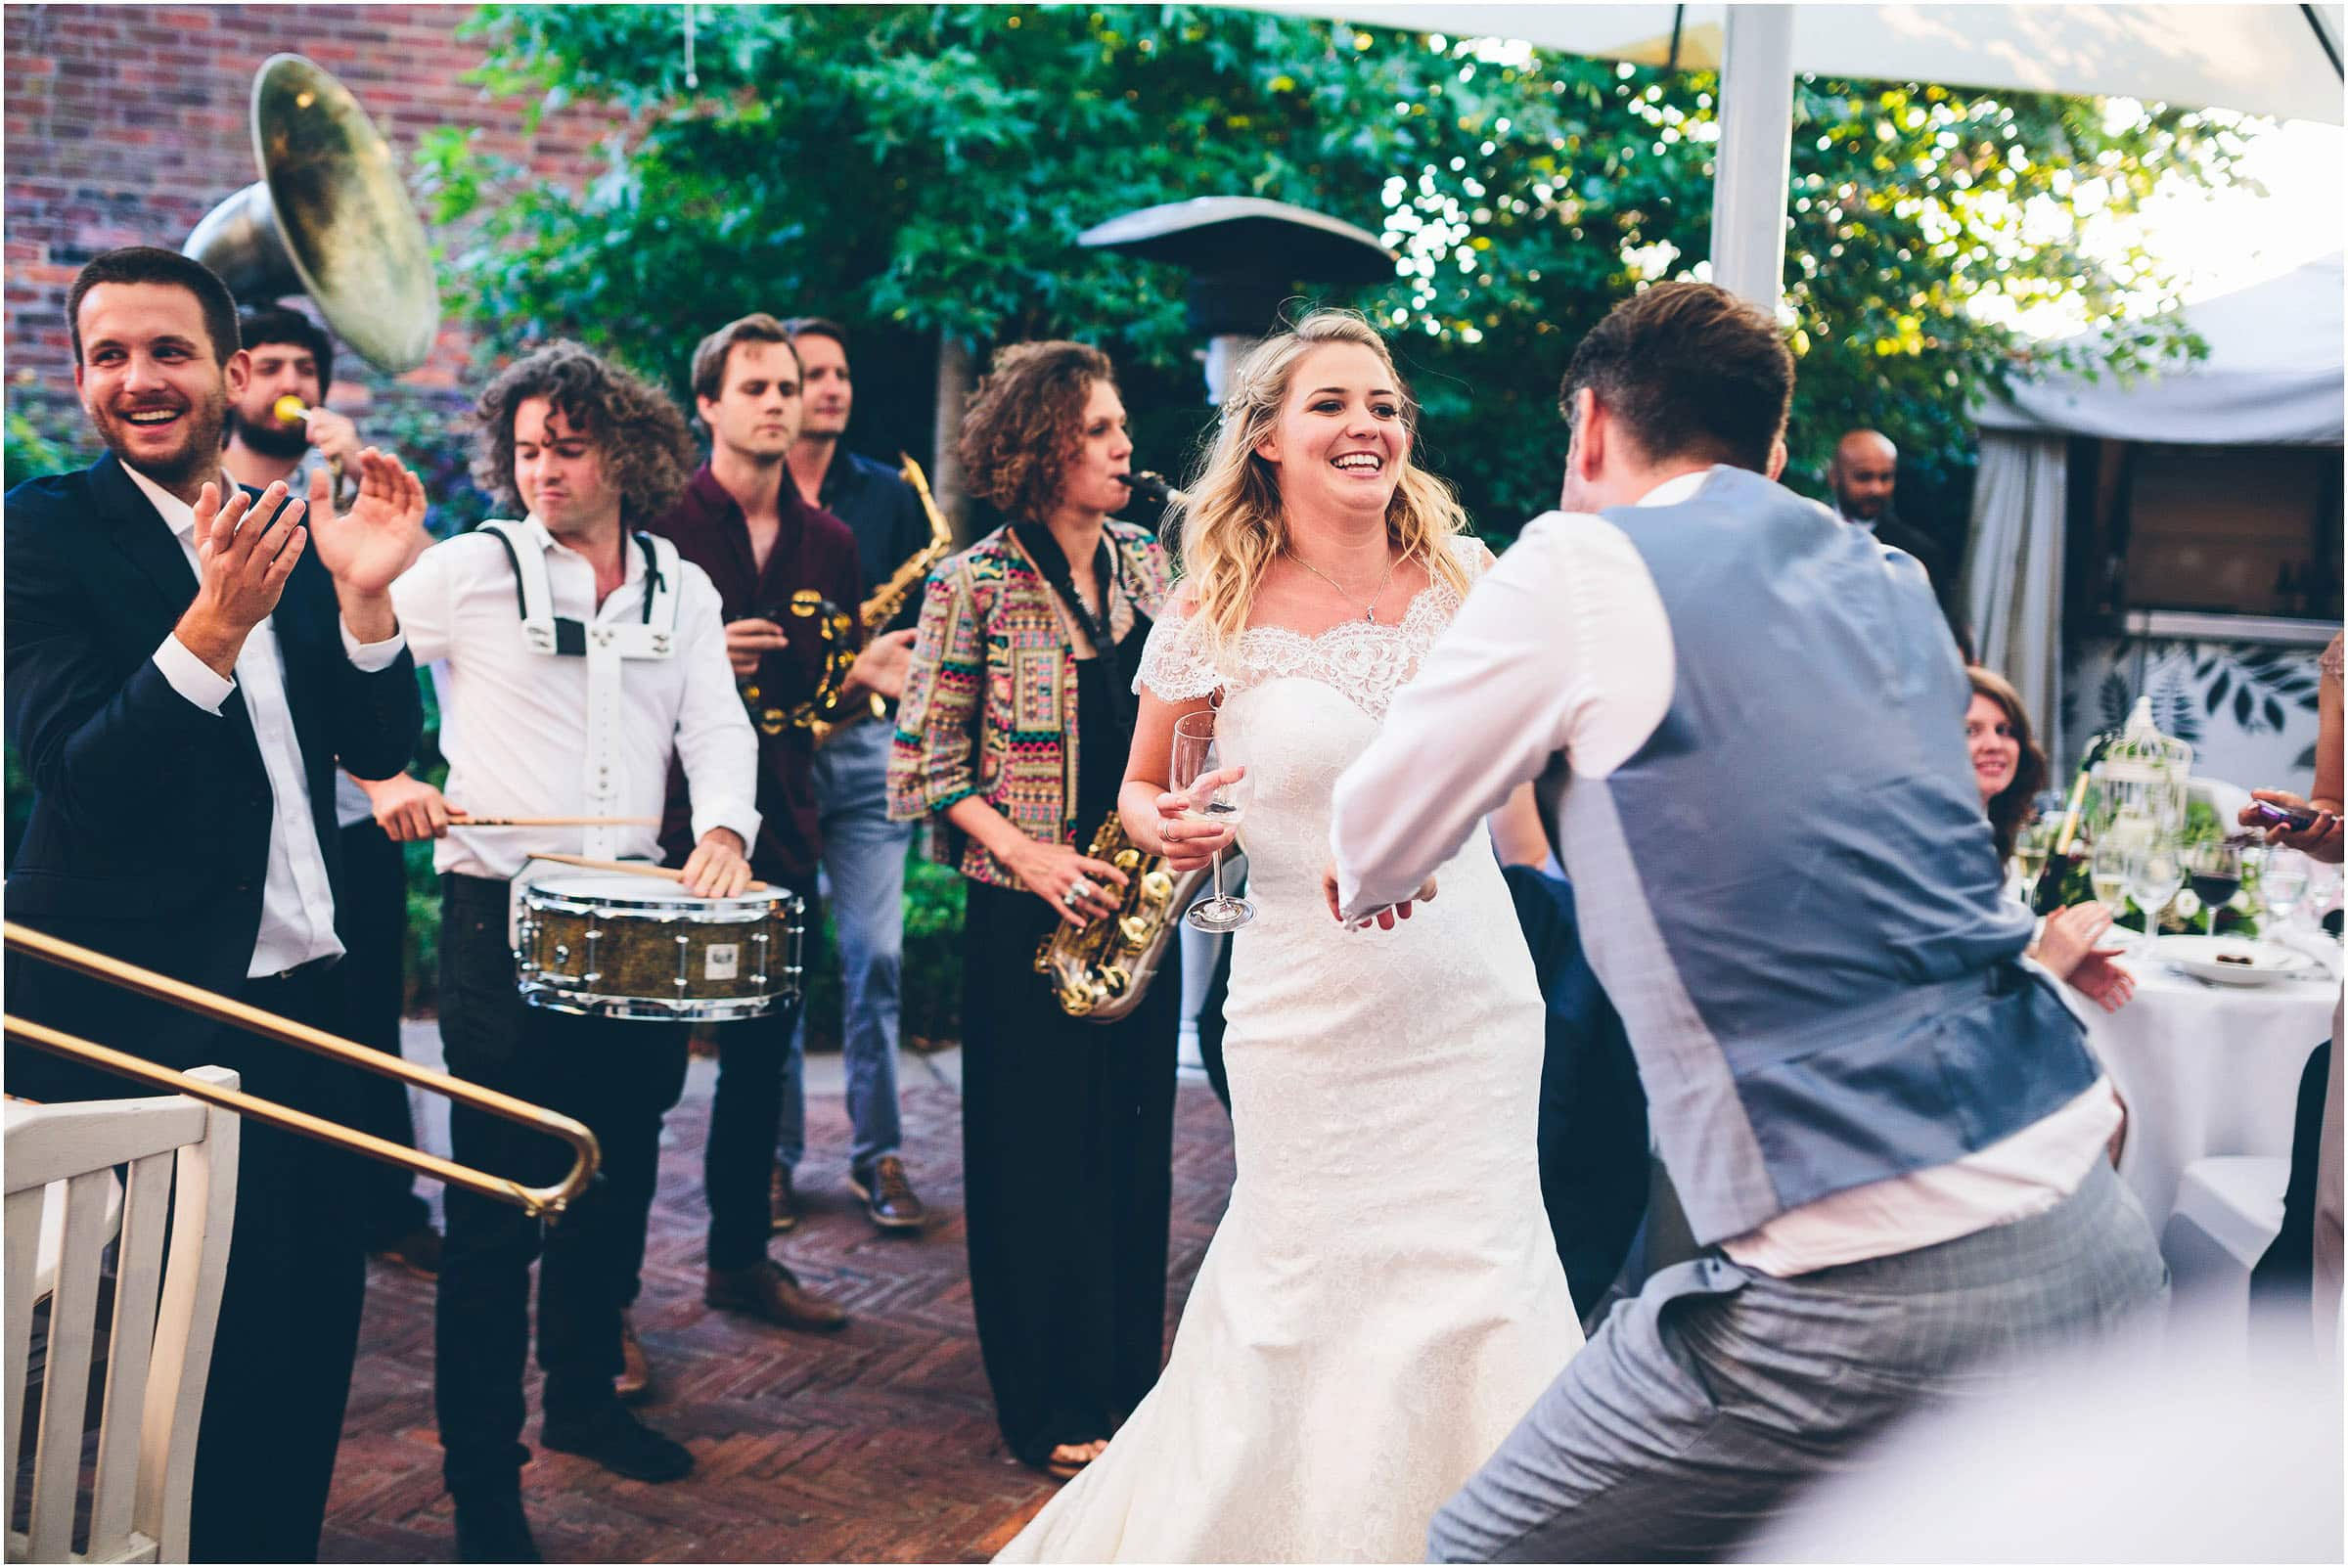 Kensington_Roof_Gardens_Wedding_Photography_0108